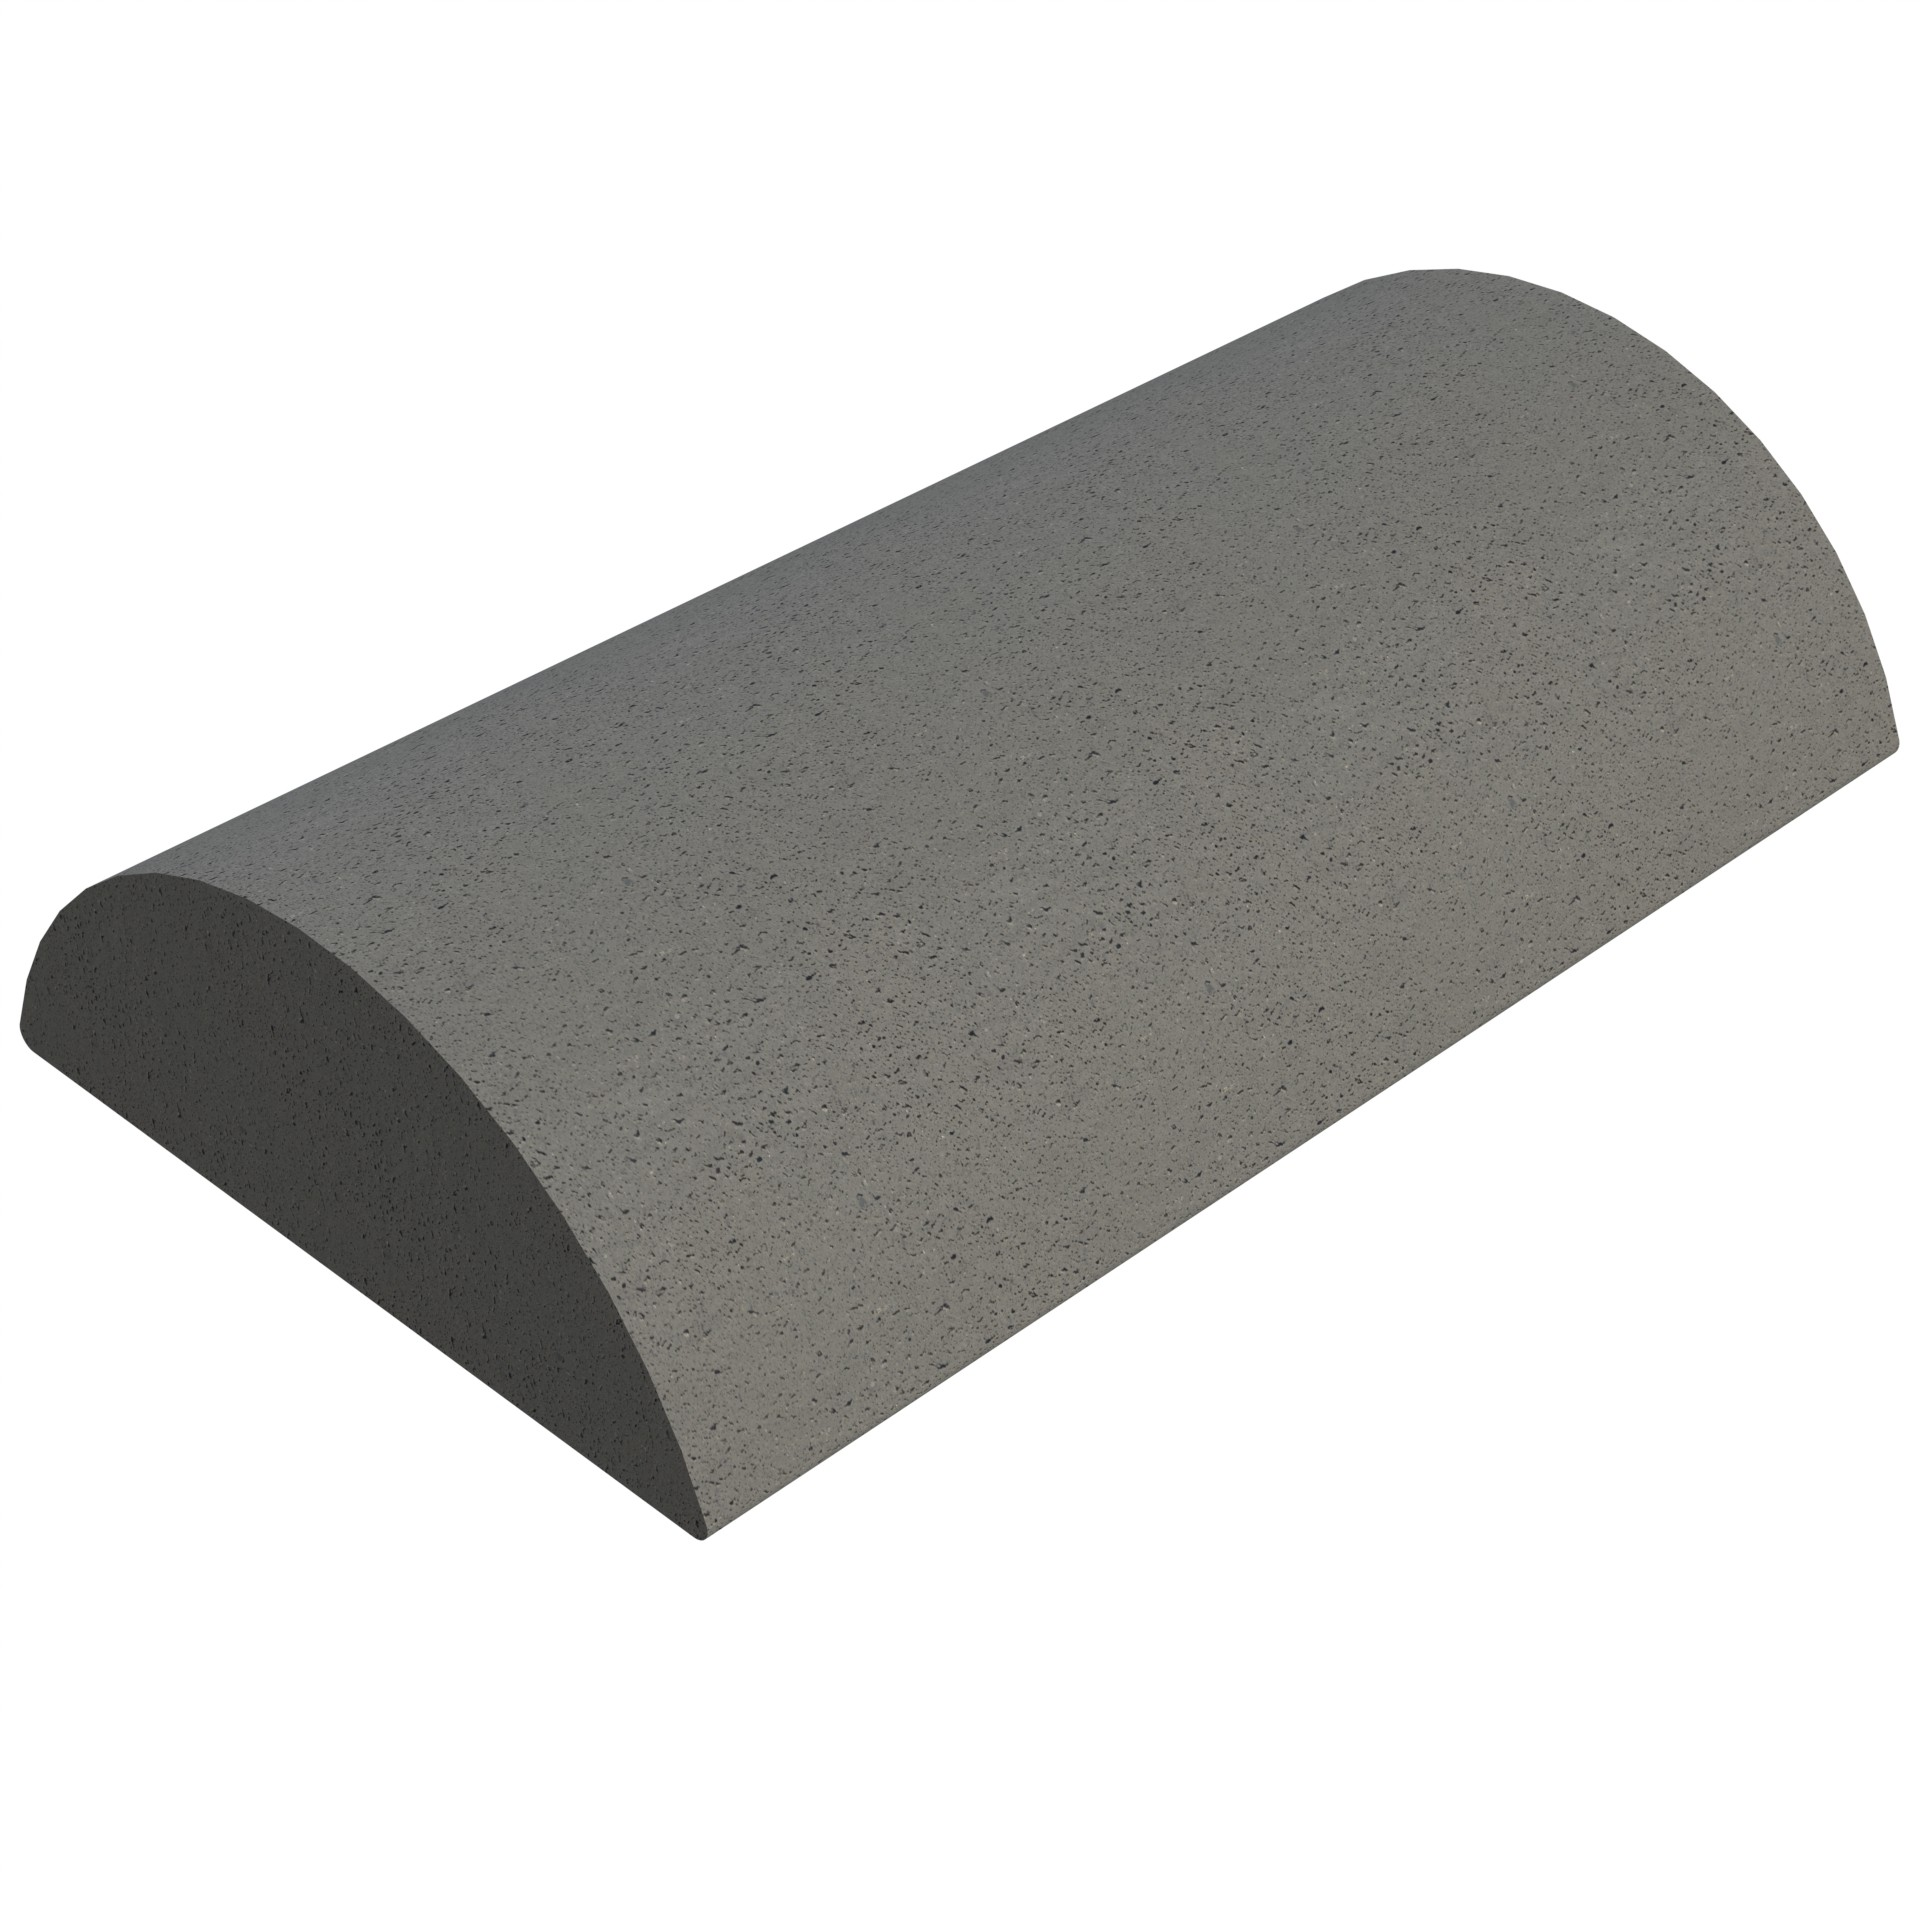 SANDTOFT TILES - Concrete Half Round Ridge With Gable Stop End